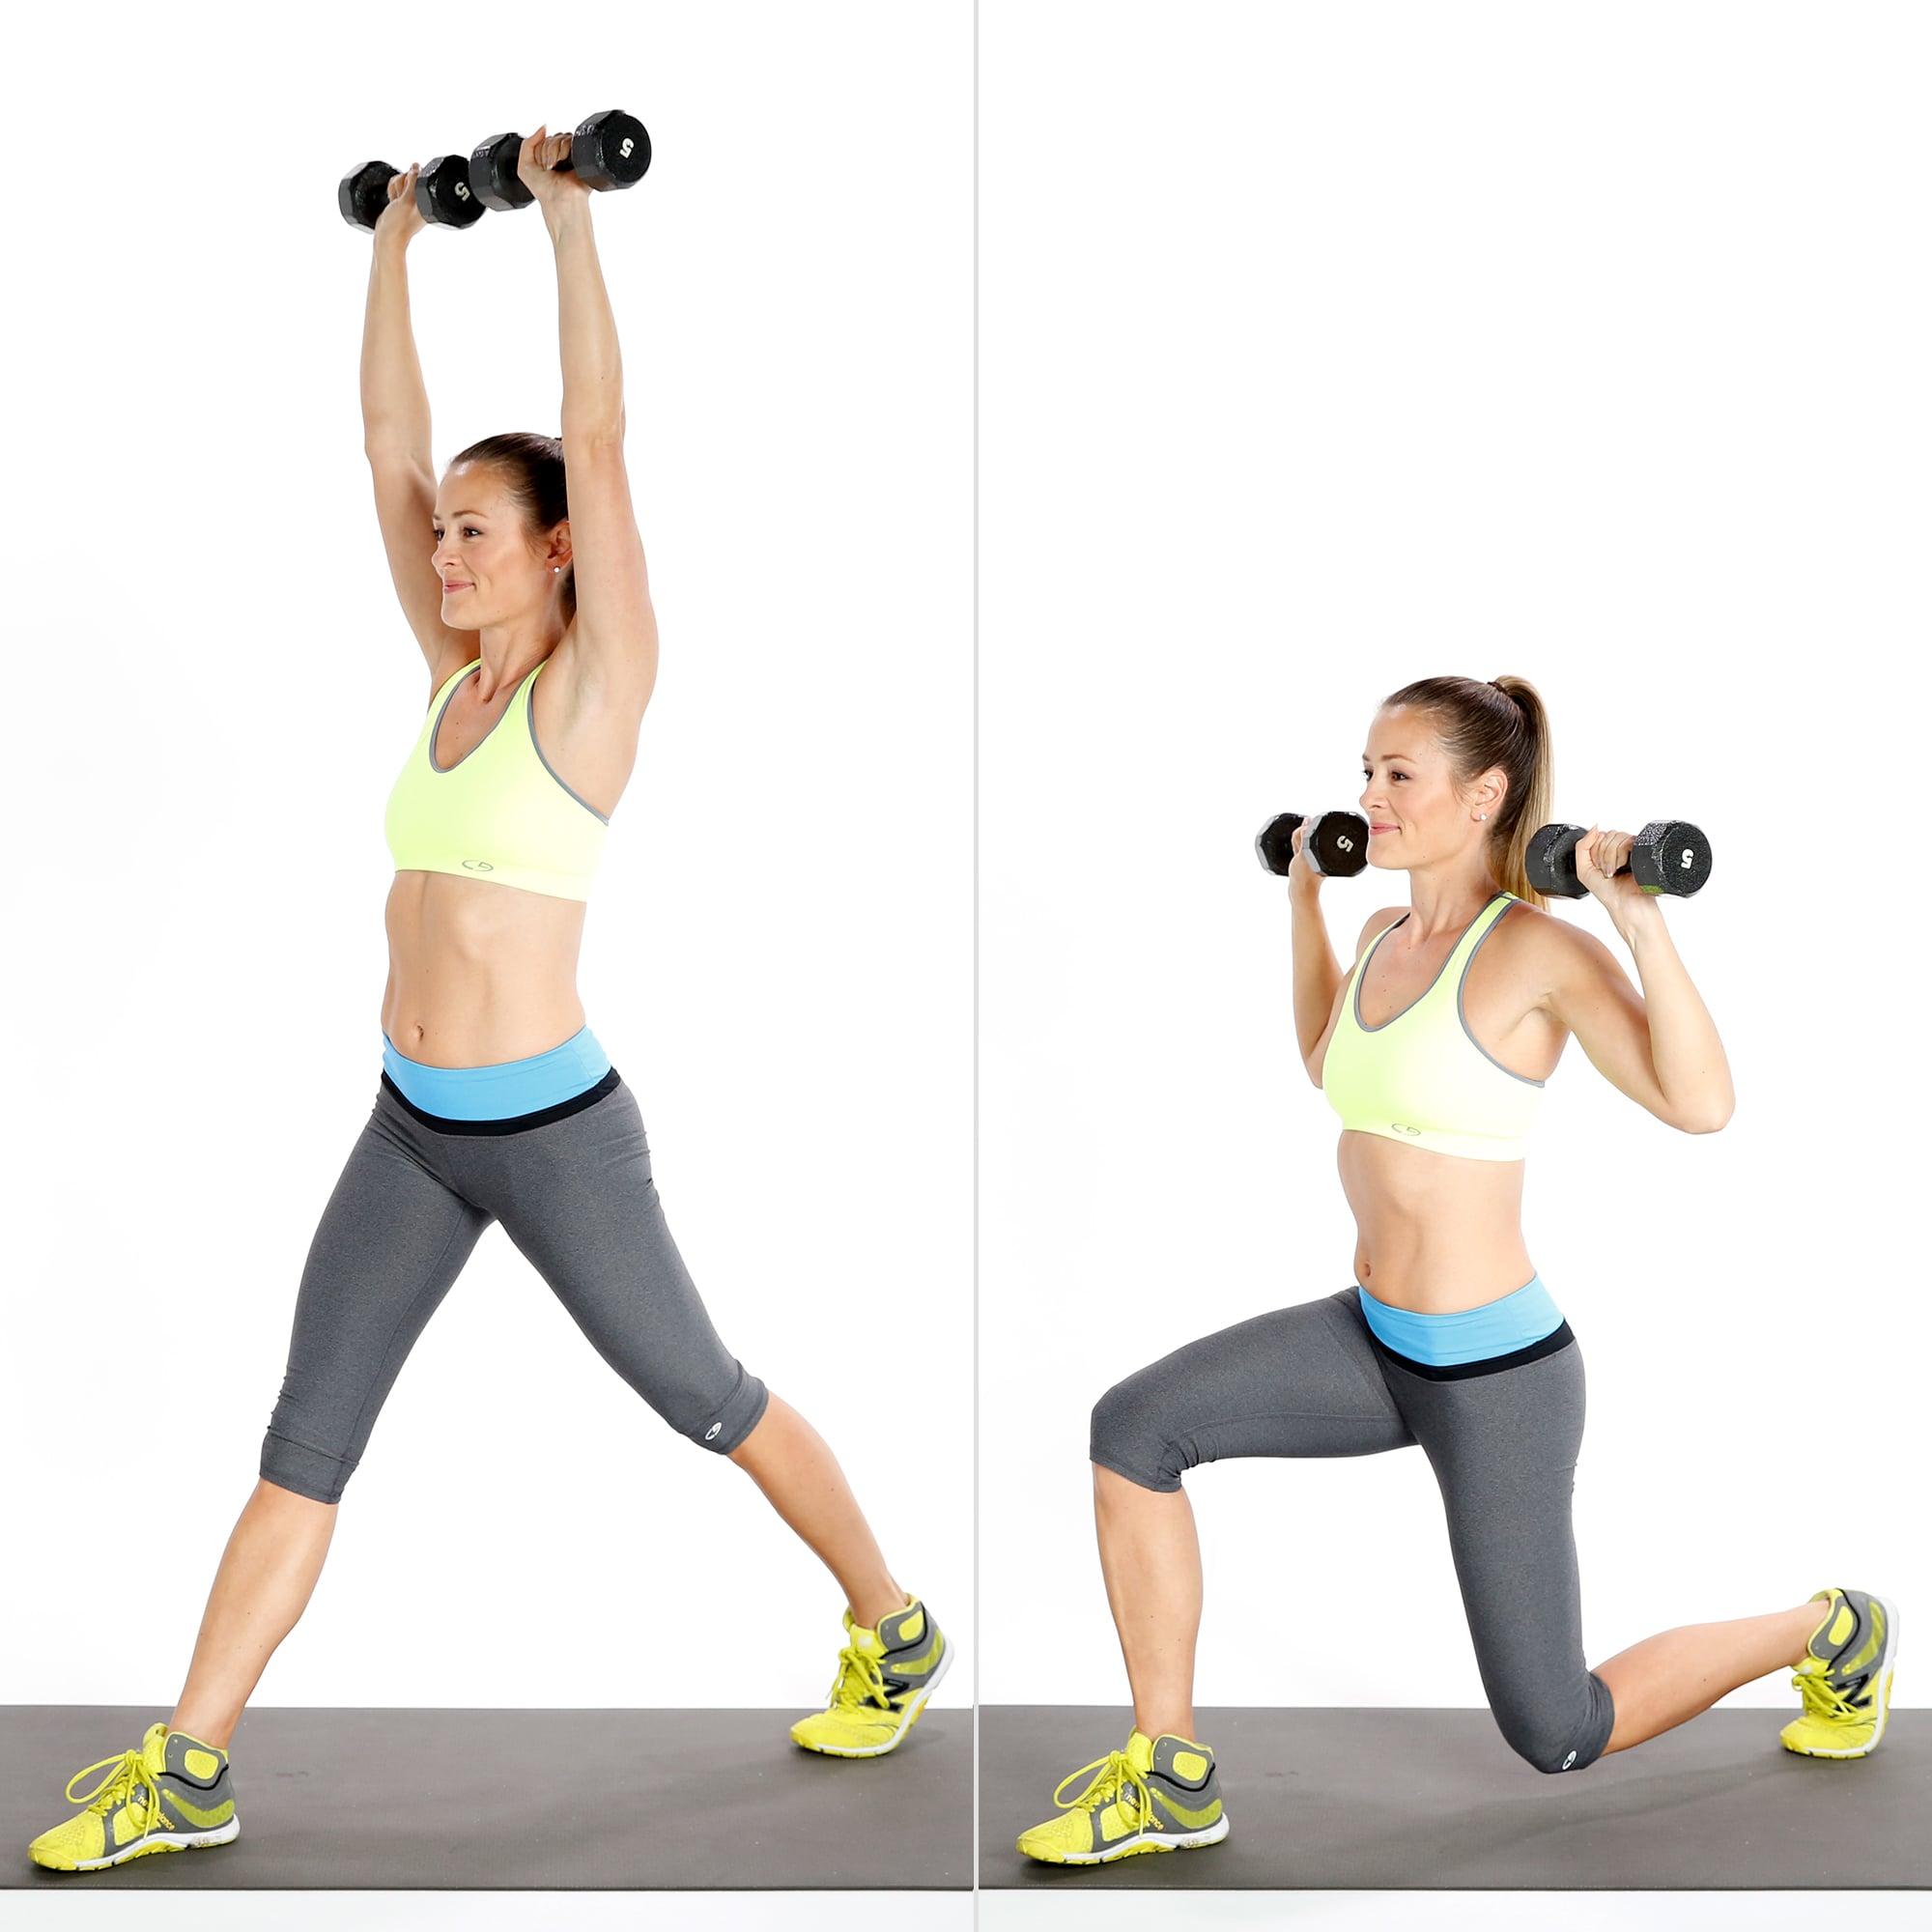 Split Squat With Overhead Press | POPSUGAR Fitness